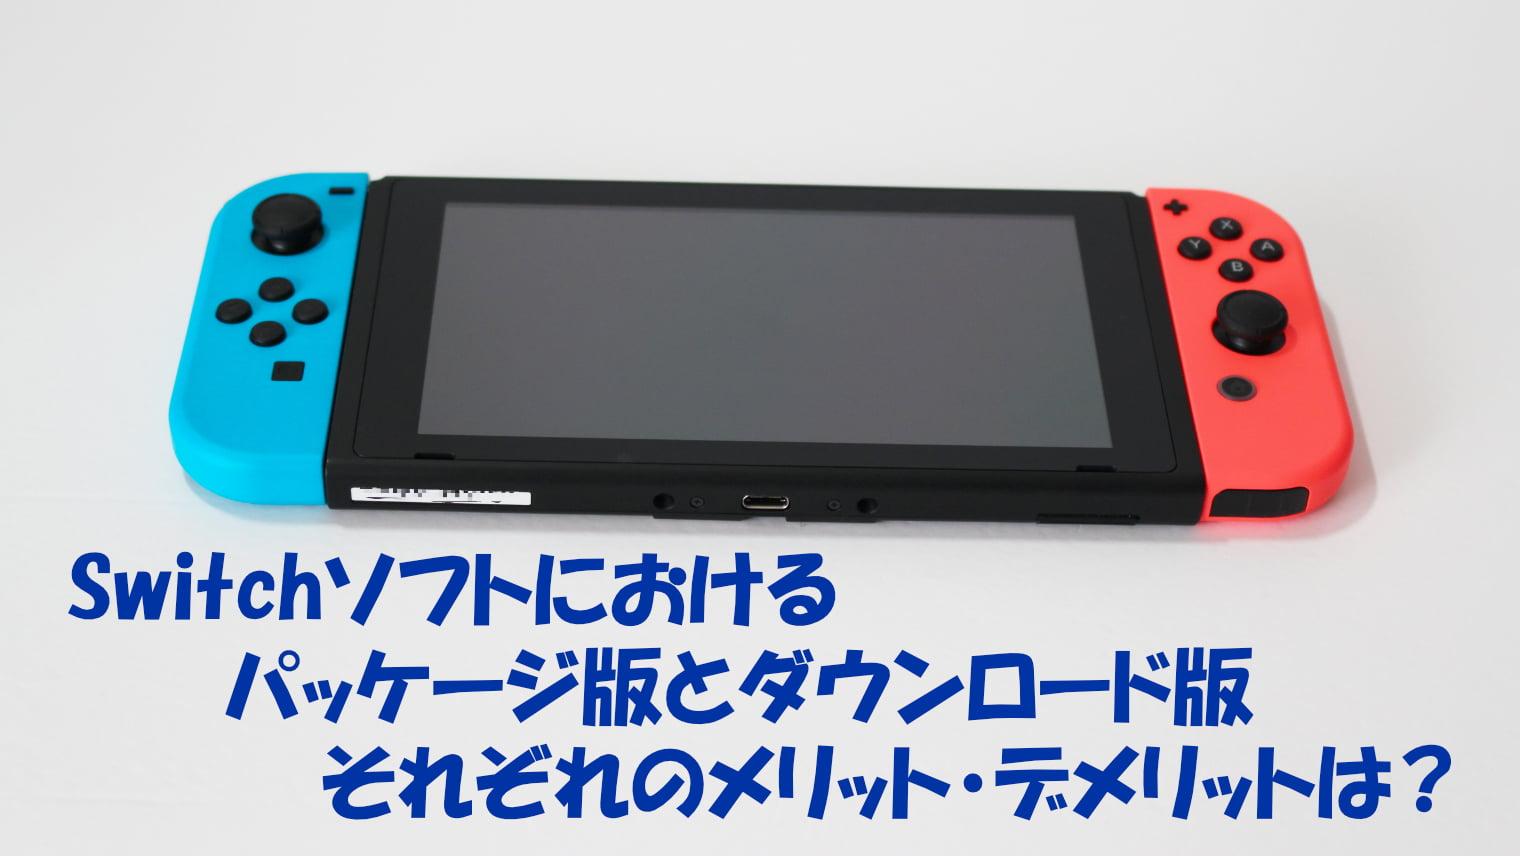 【Nintendo Switch】ソフトのパッケージ版/DL版のメリット・デメリットを解説